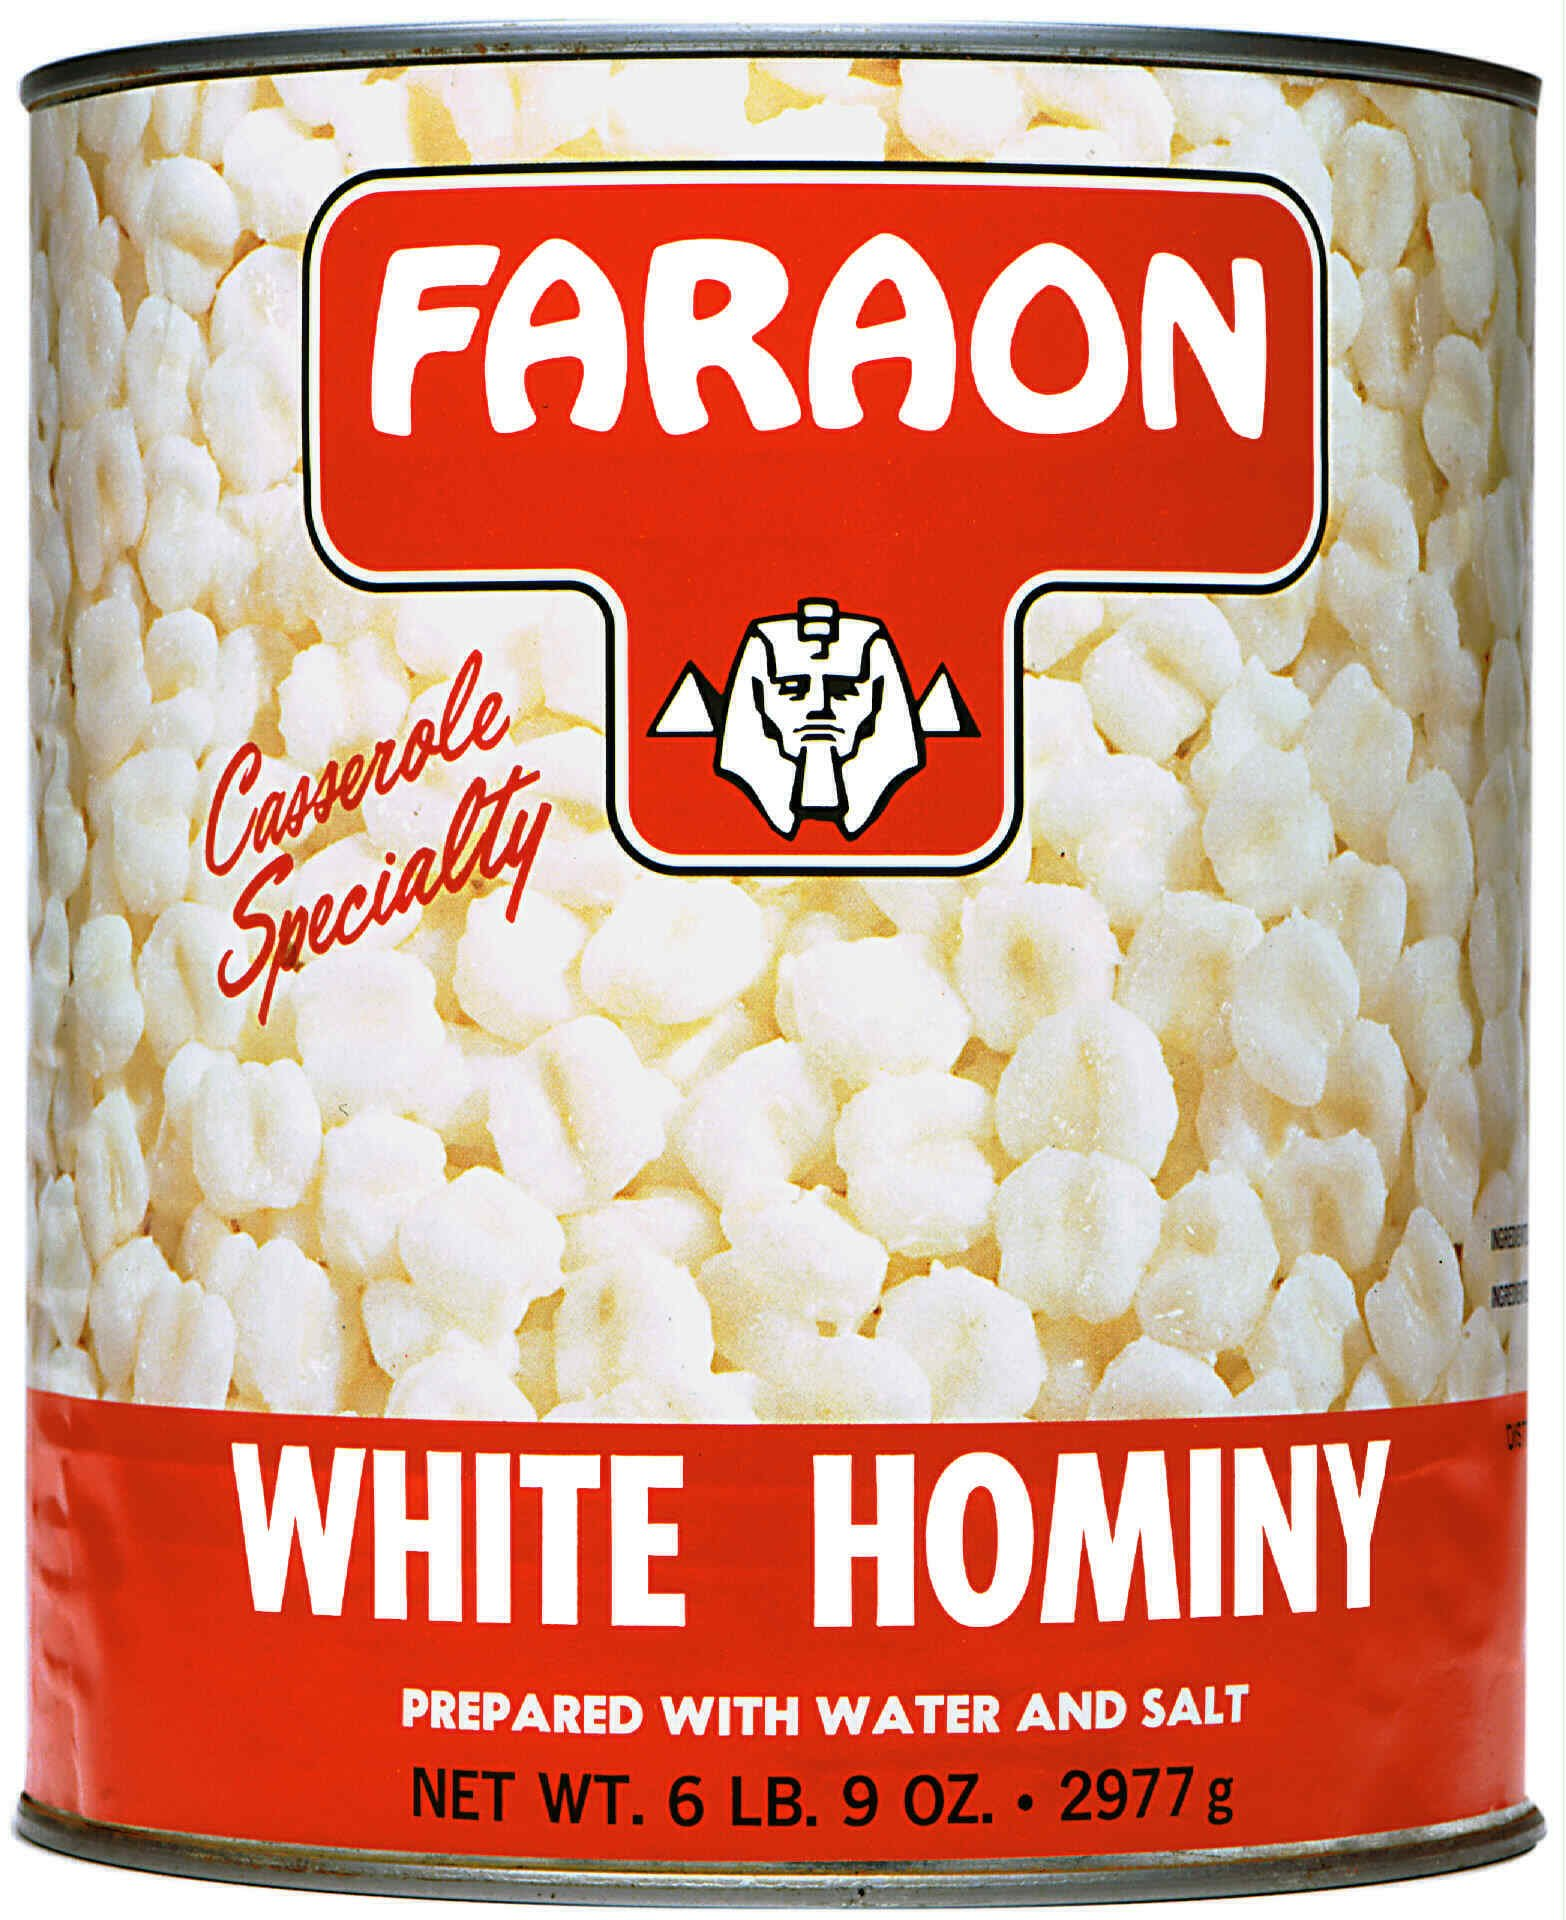 FARAON Hominy White, 105 Ounce (Pack of 6)